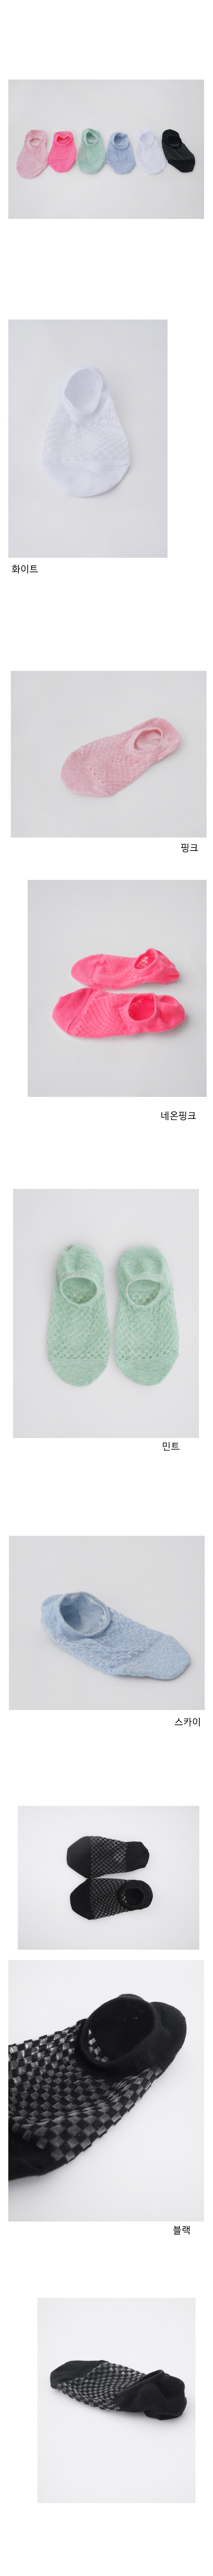 check mono socks